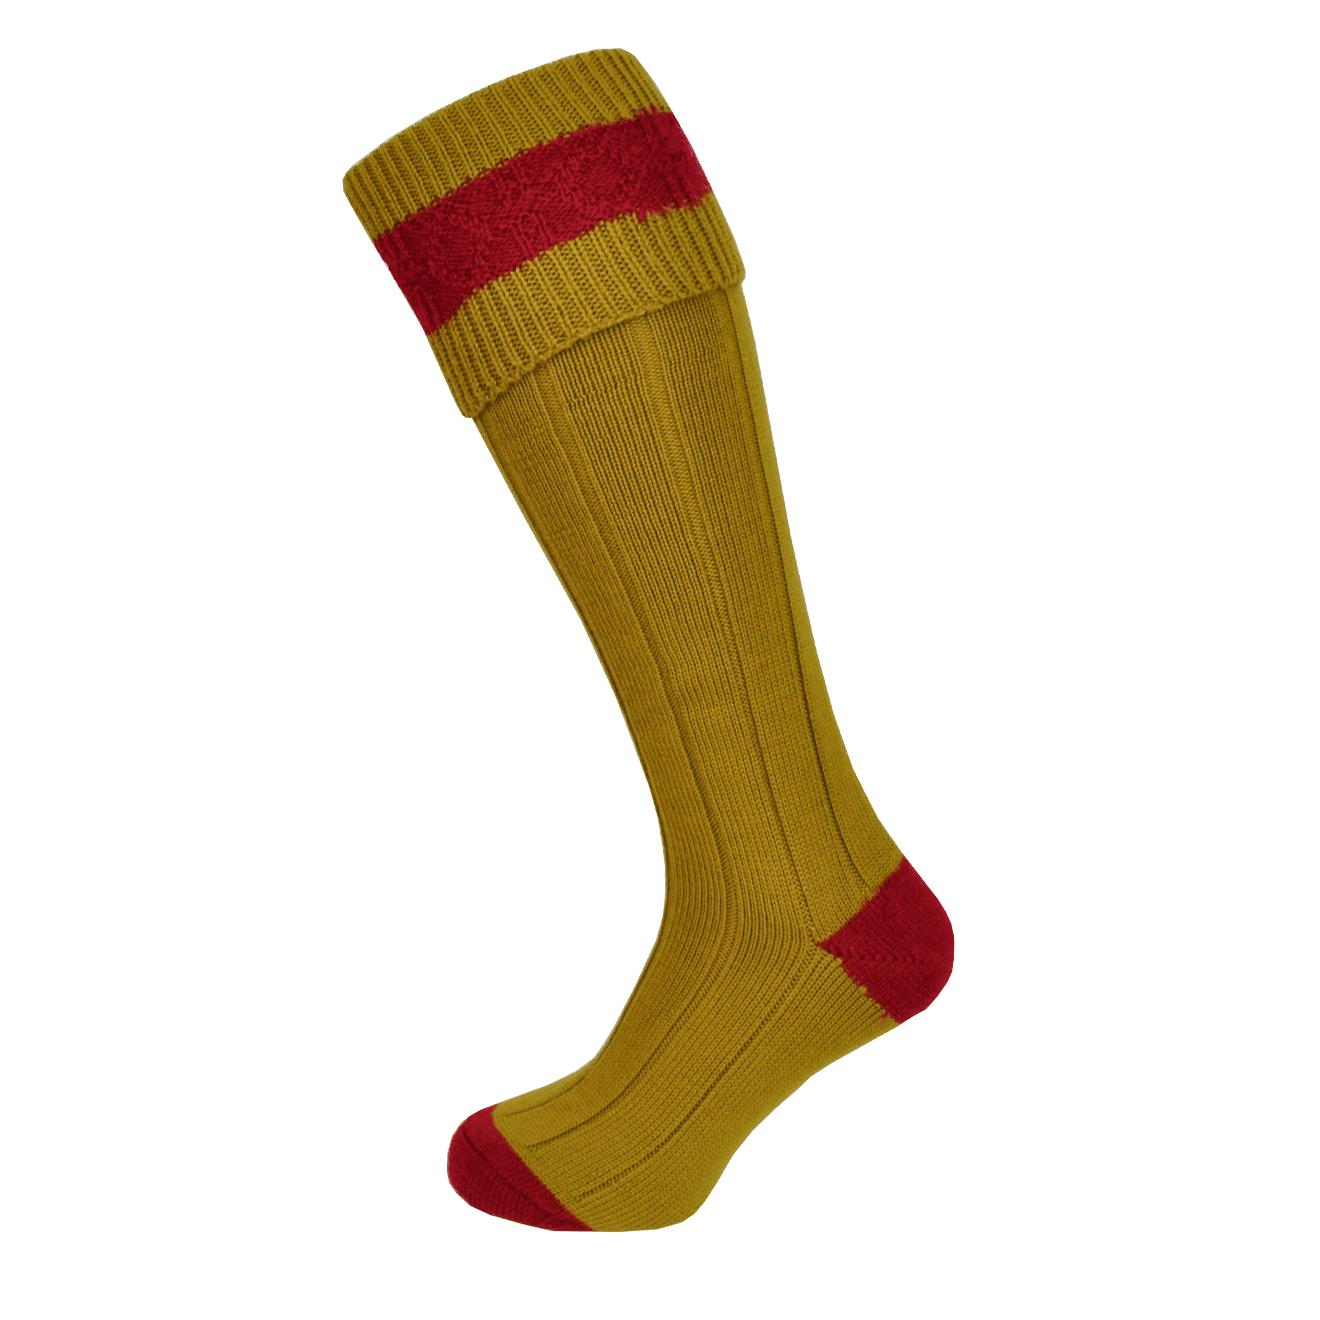 Macfarlaine Contrast Shooting Socks Mustard / Cherry